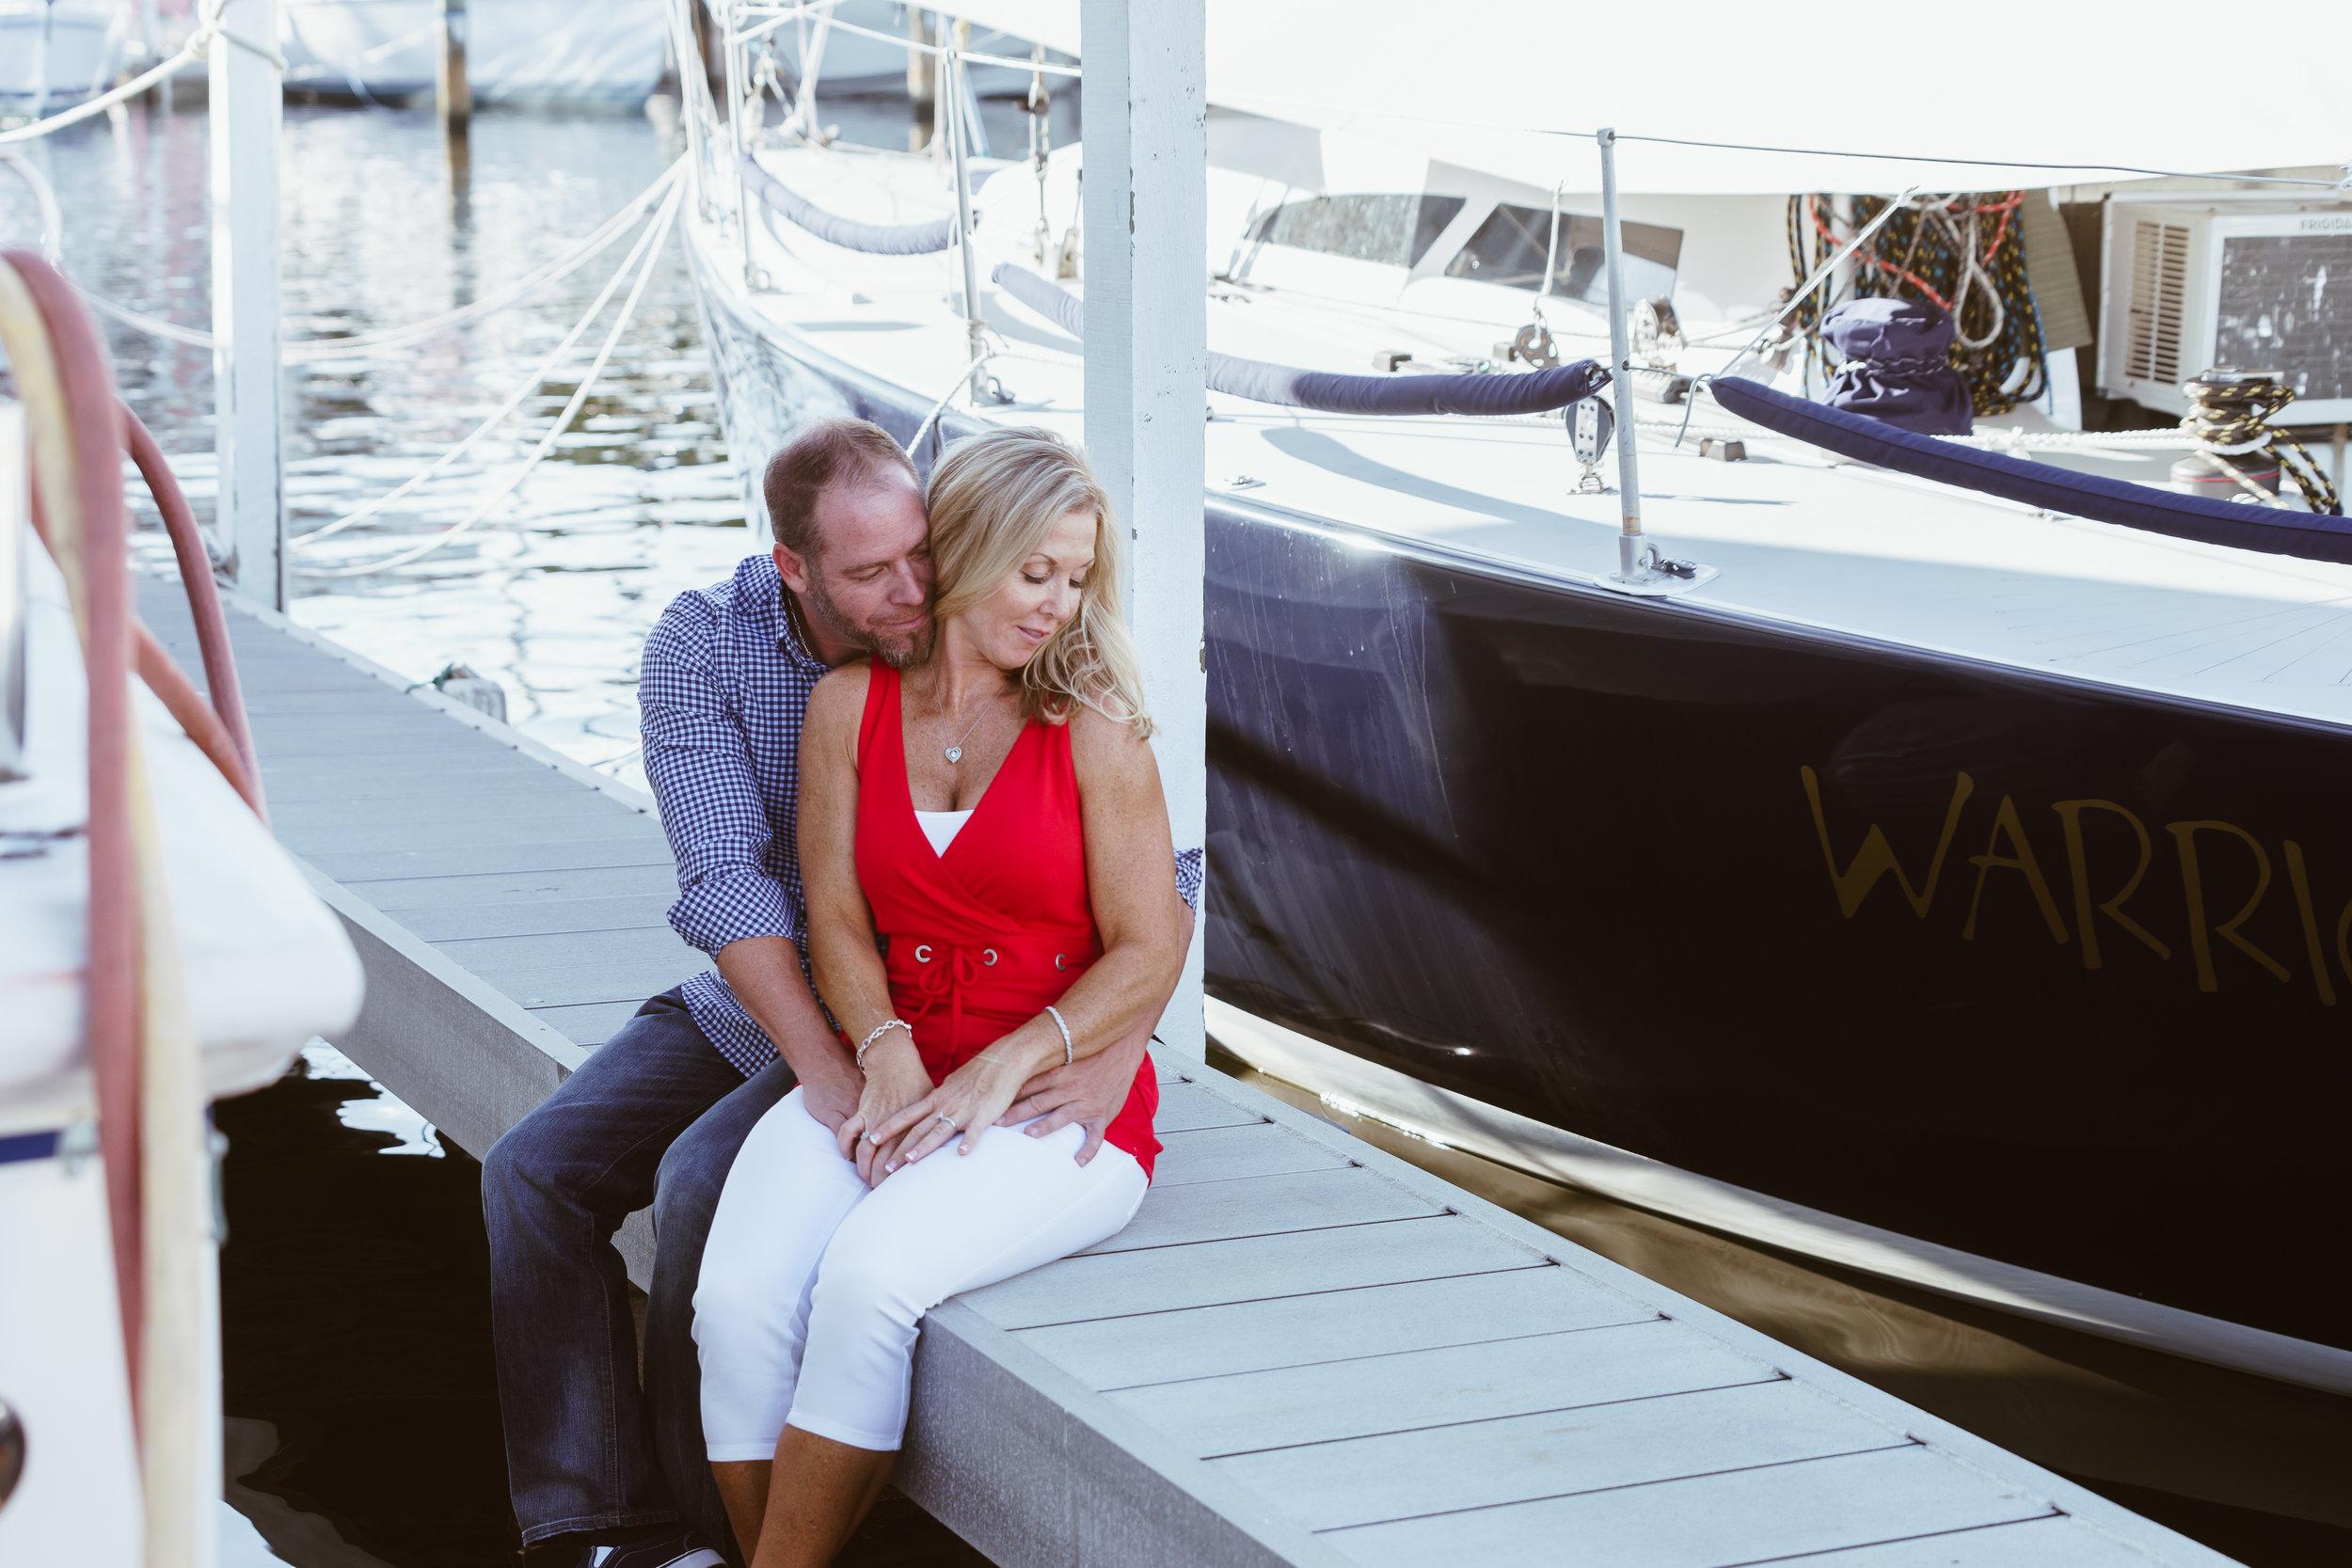 St.Petersburg engagement session, St.Pete wedding photographer, St.Petersburg Yacht Club. Tampa wedding photographer